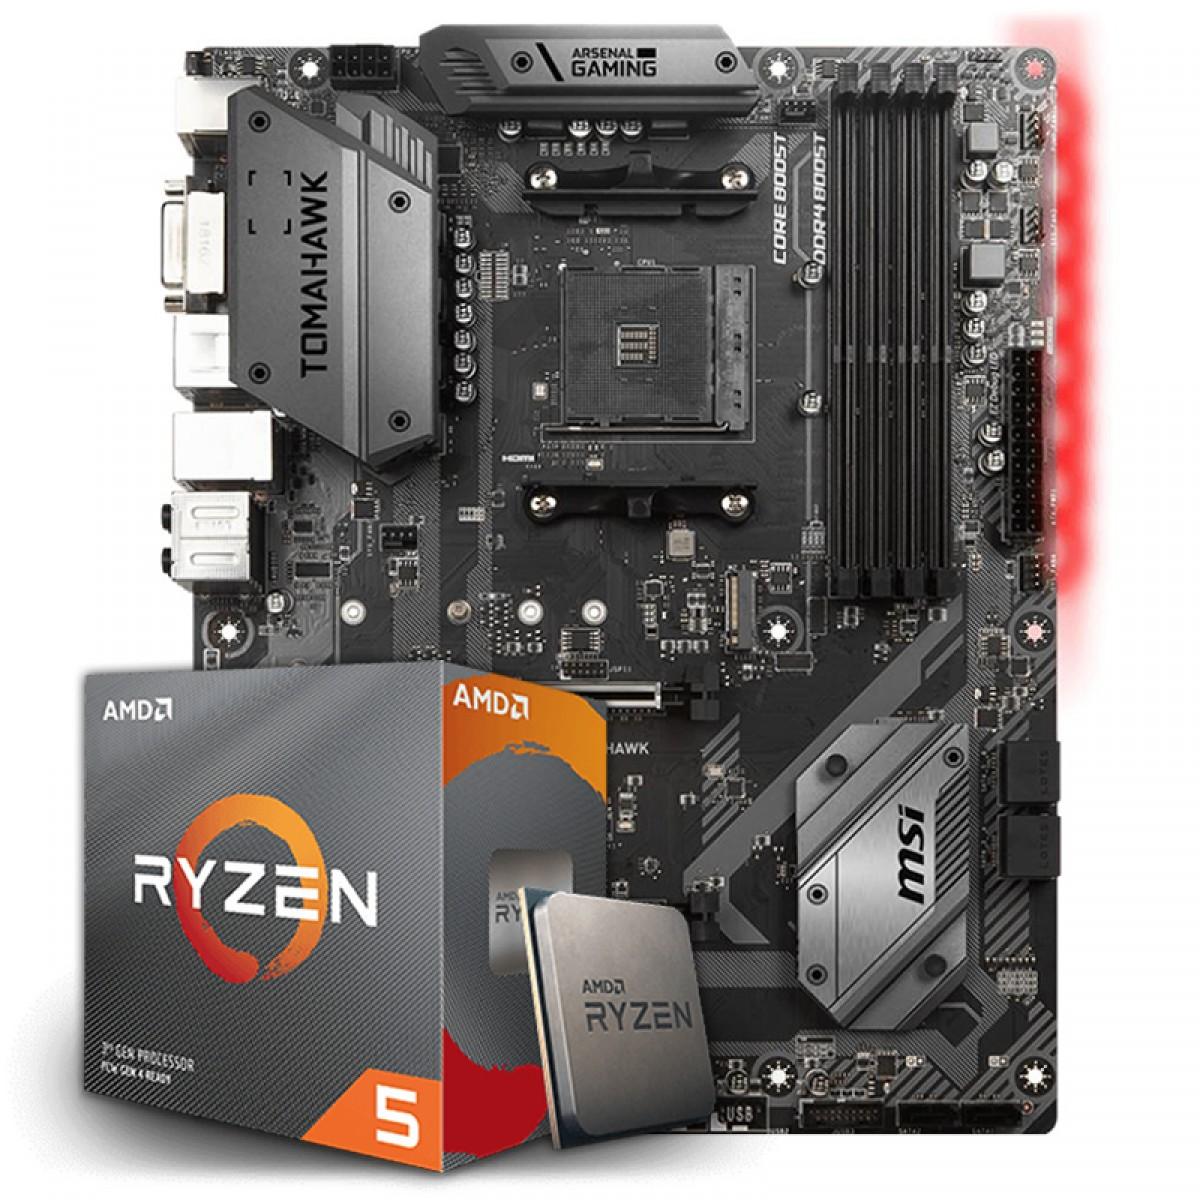 Kit Upgrade Placa Mãe MSI B450 Tomahawk AMD AM4 + Processador AMD Ryzen 5 3600 3.6GHz